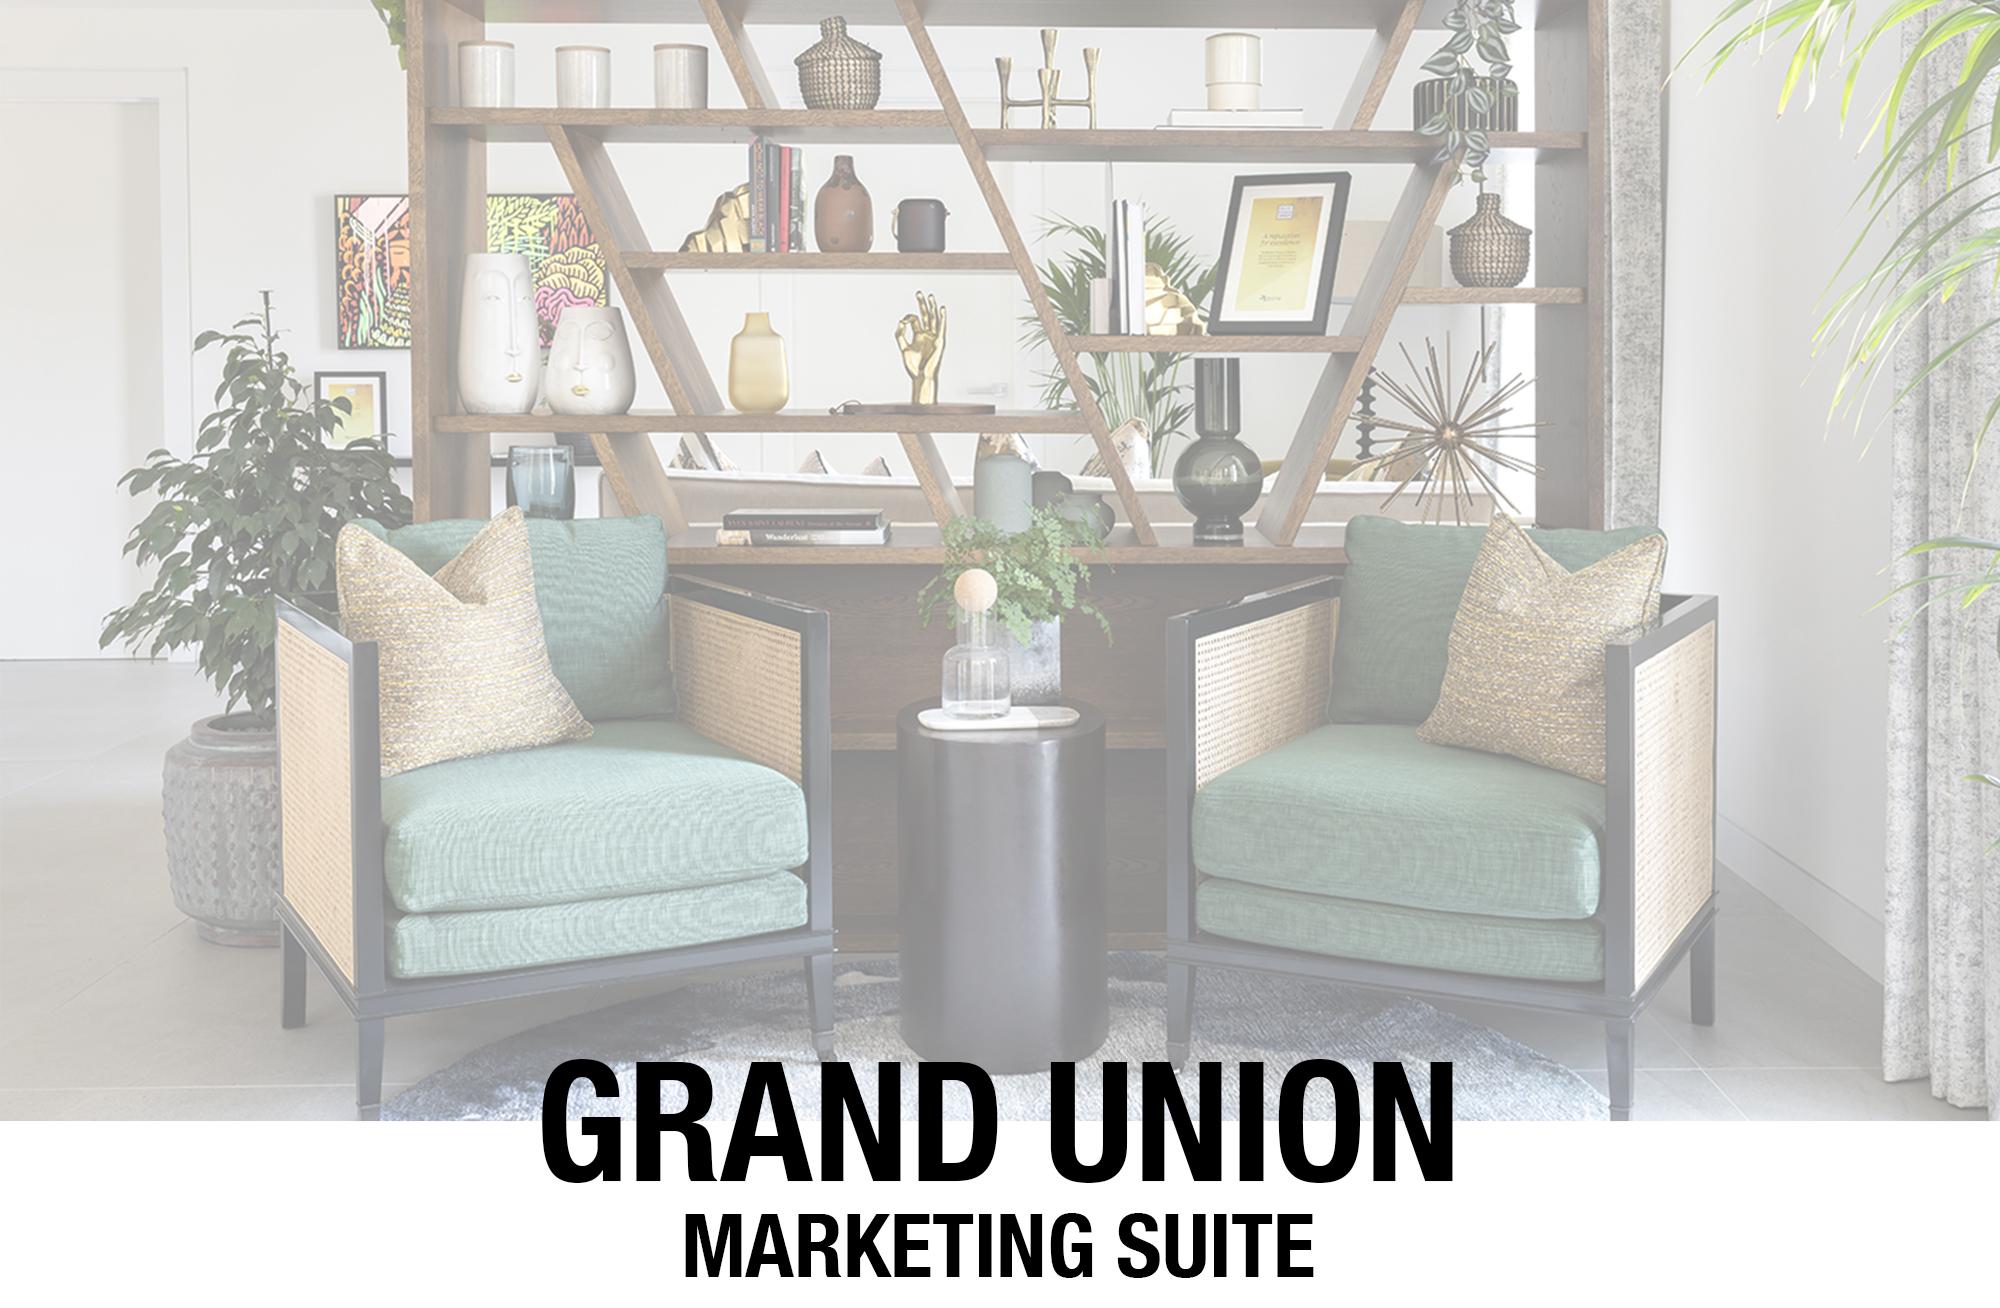 Grand Union Marketing Suite 5.jpg